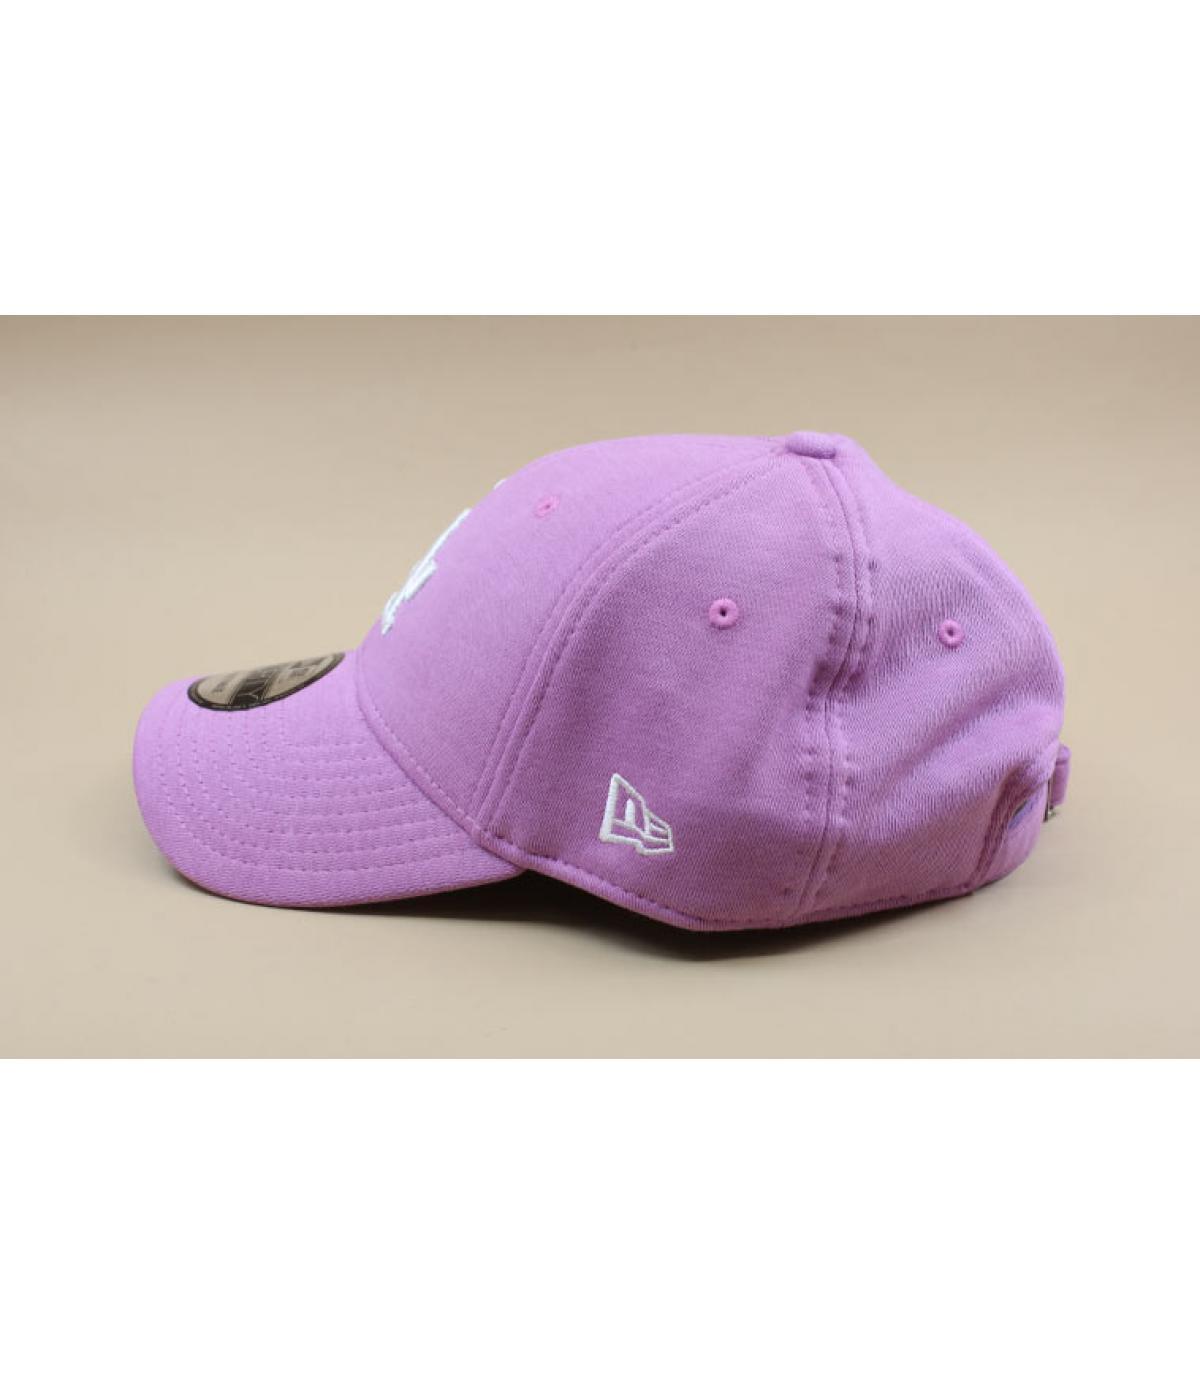 Details Jersey Pack 940 LA pink - Abbildung 4